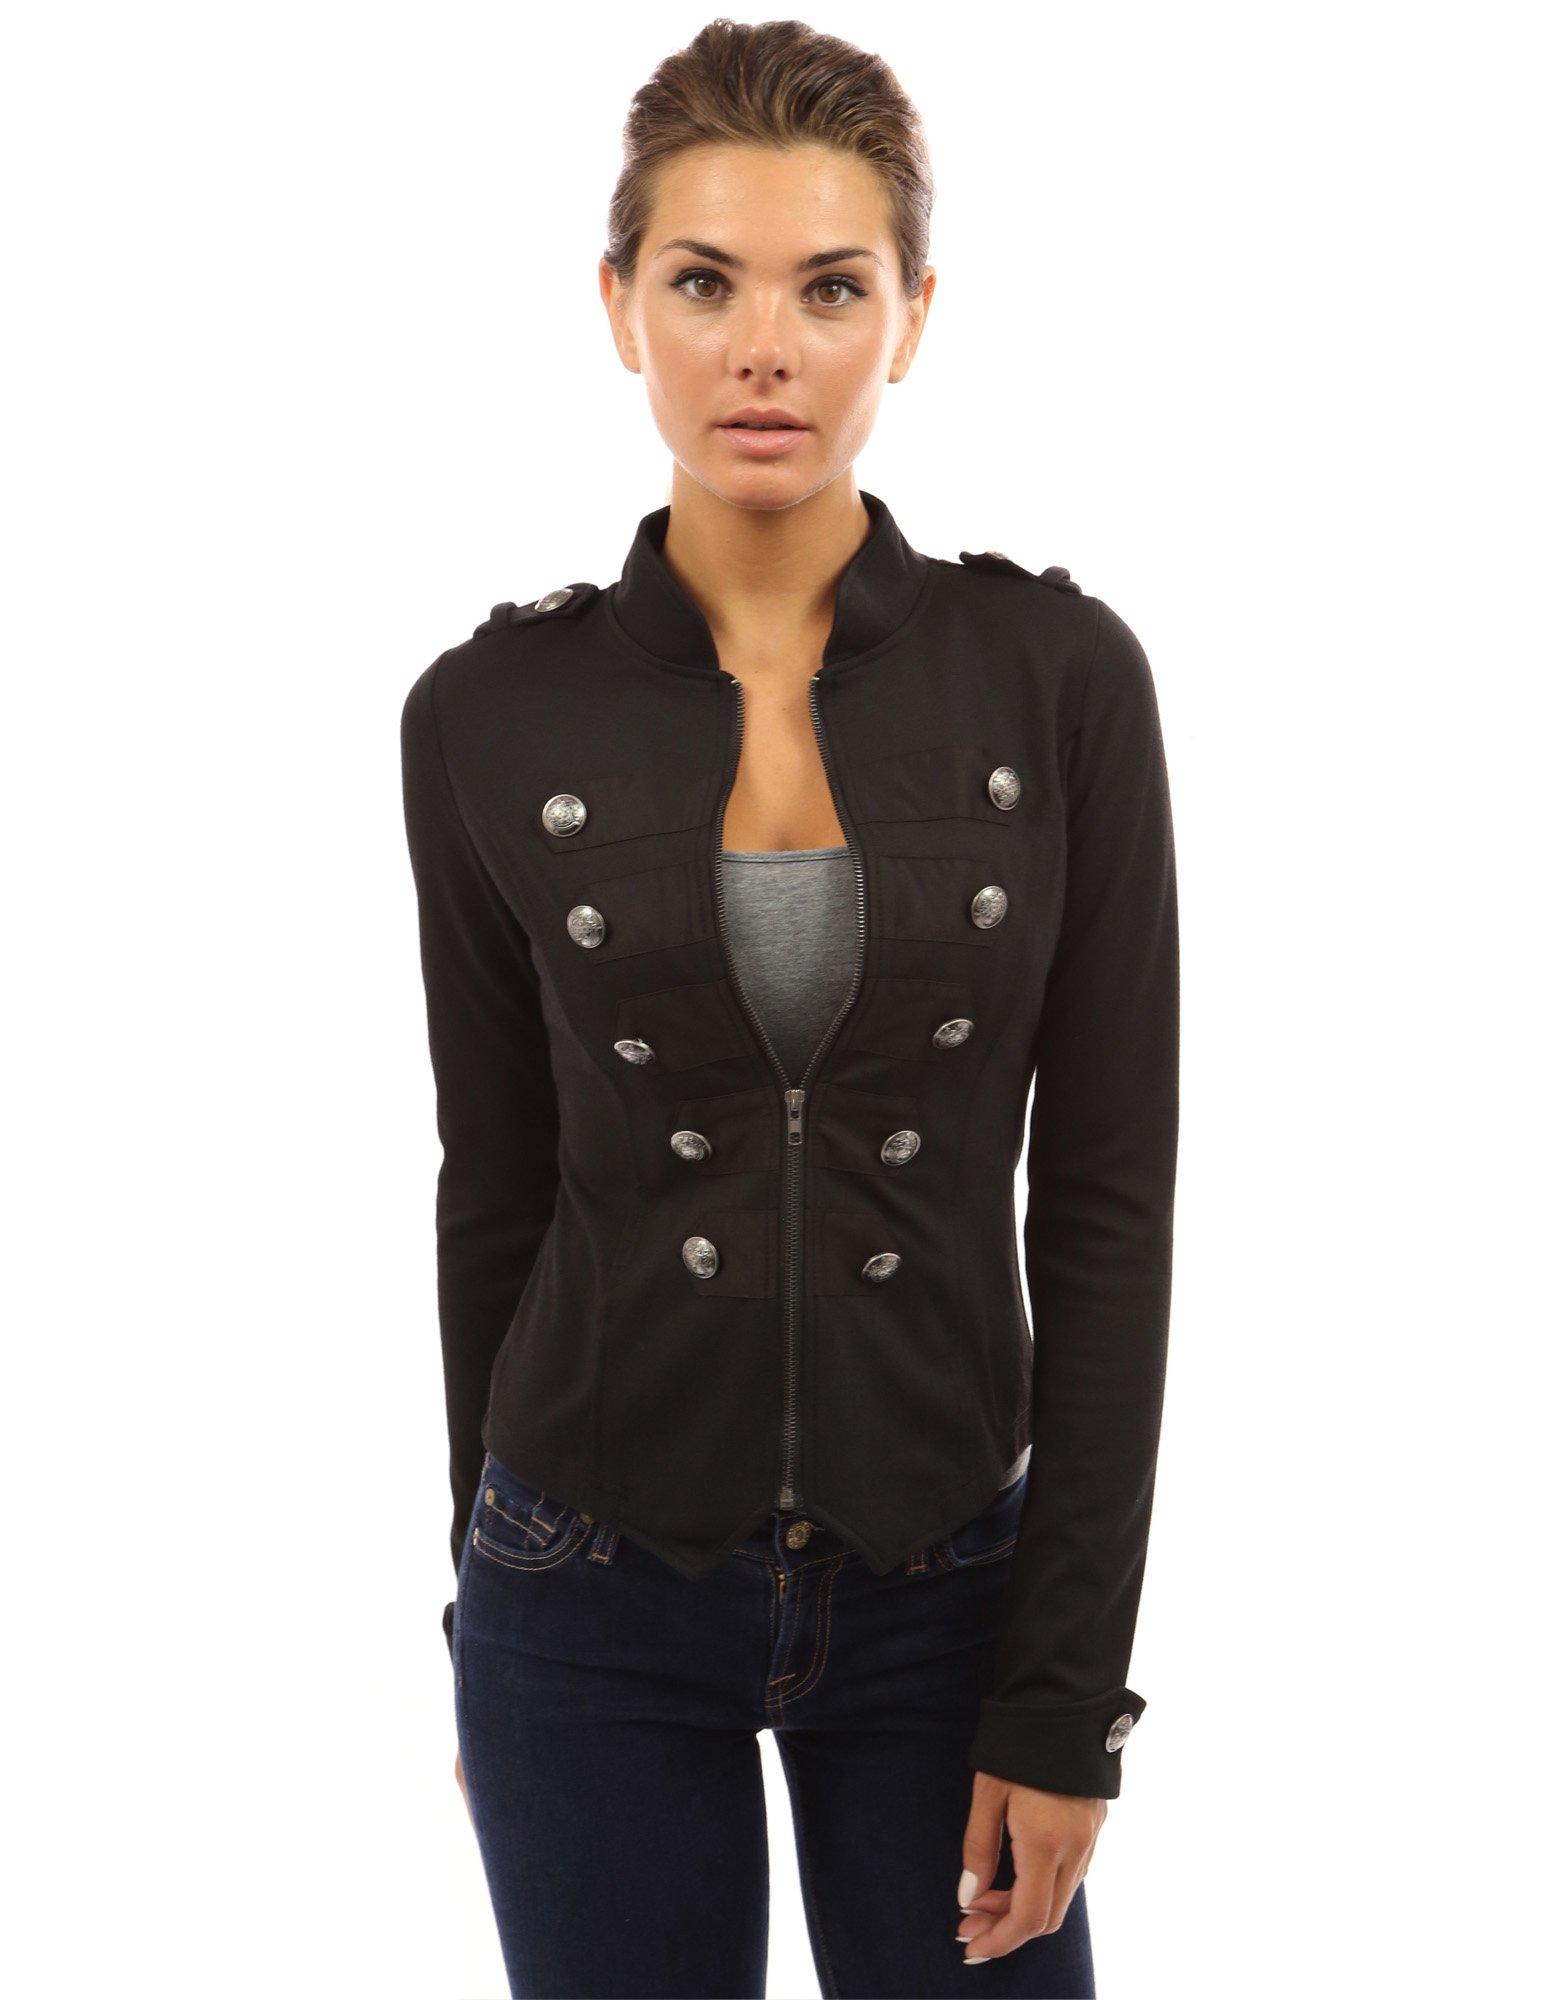 PattyBoutik Women's Zip Front Stand Collar Military Light Jacket (Black L)